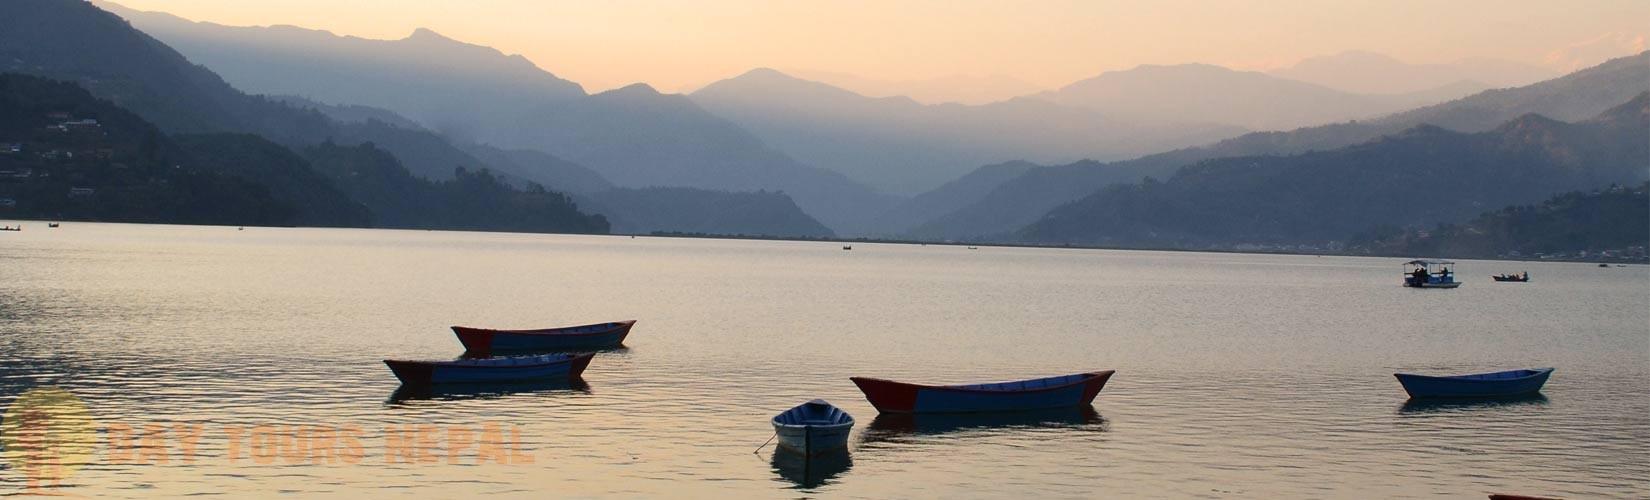 Nepal Scenic Tour Day Tours Nepal